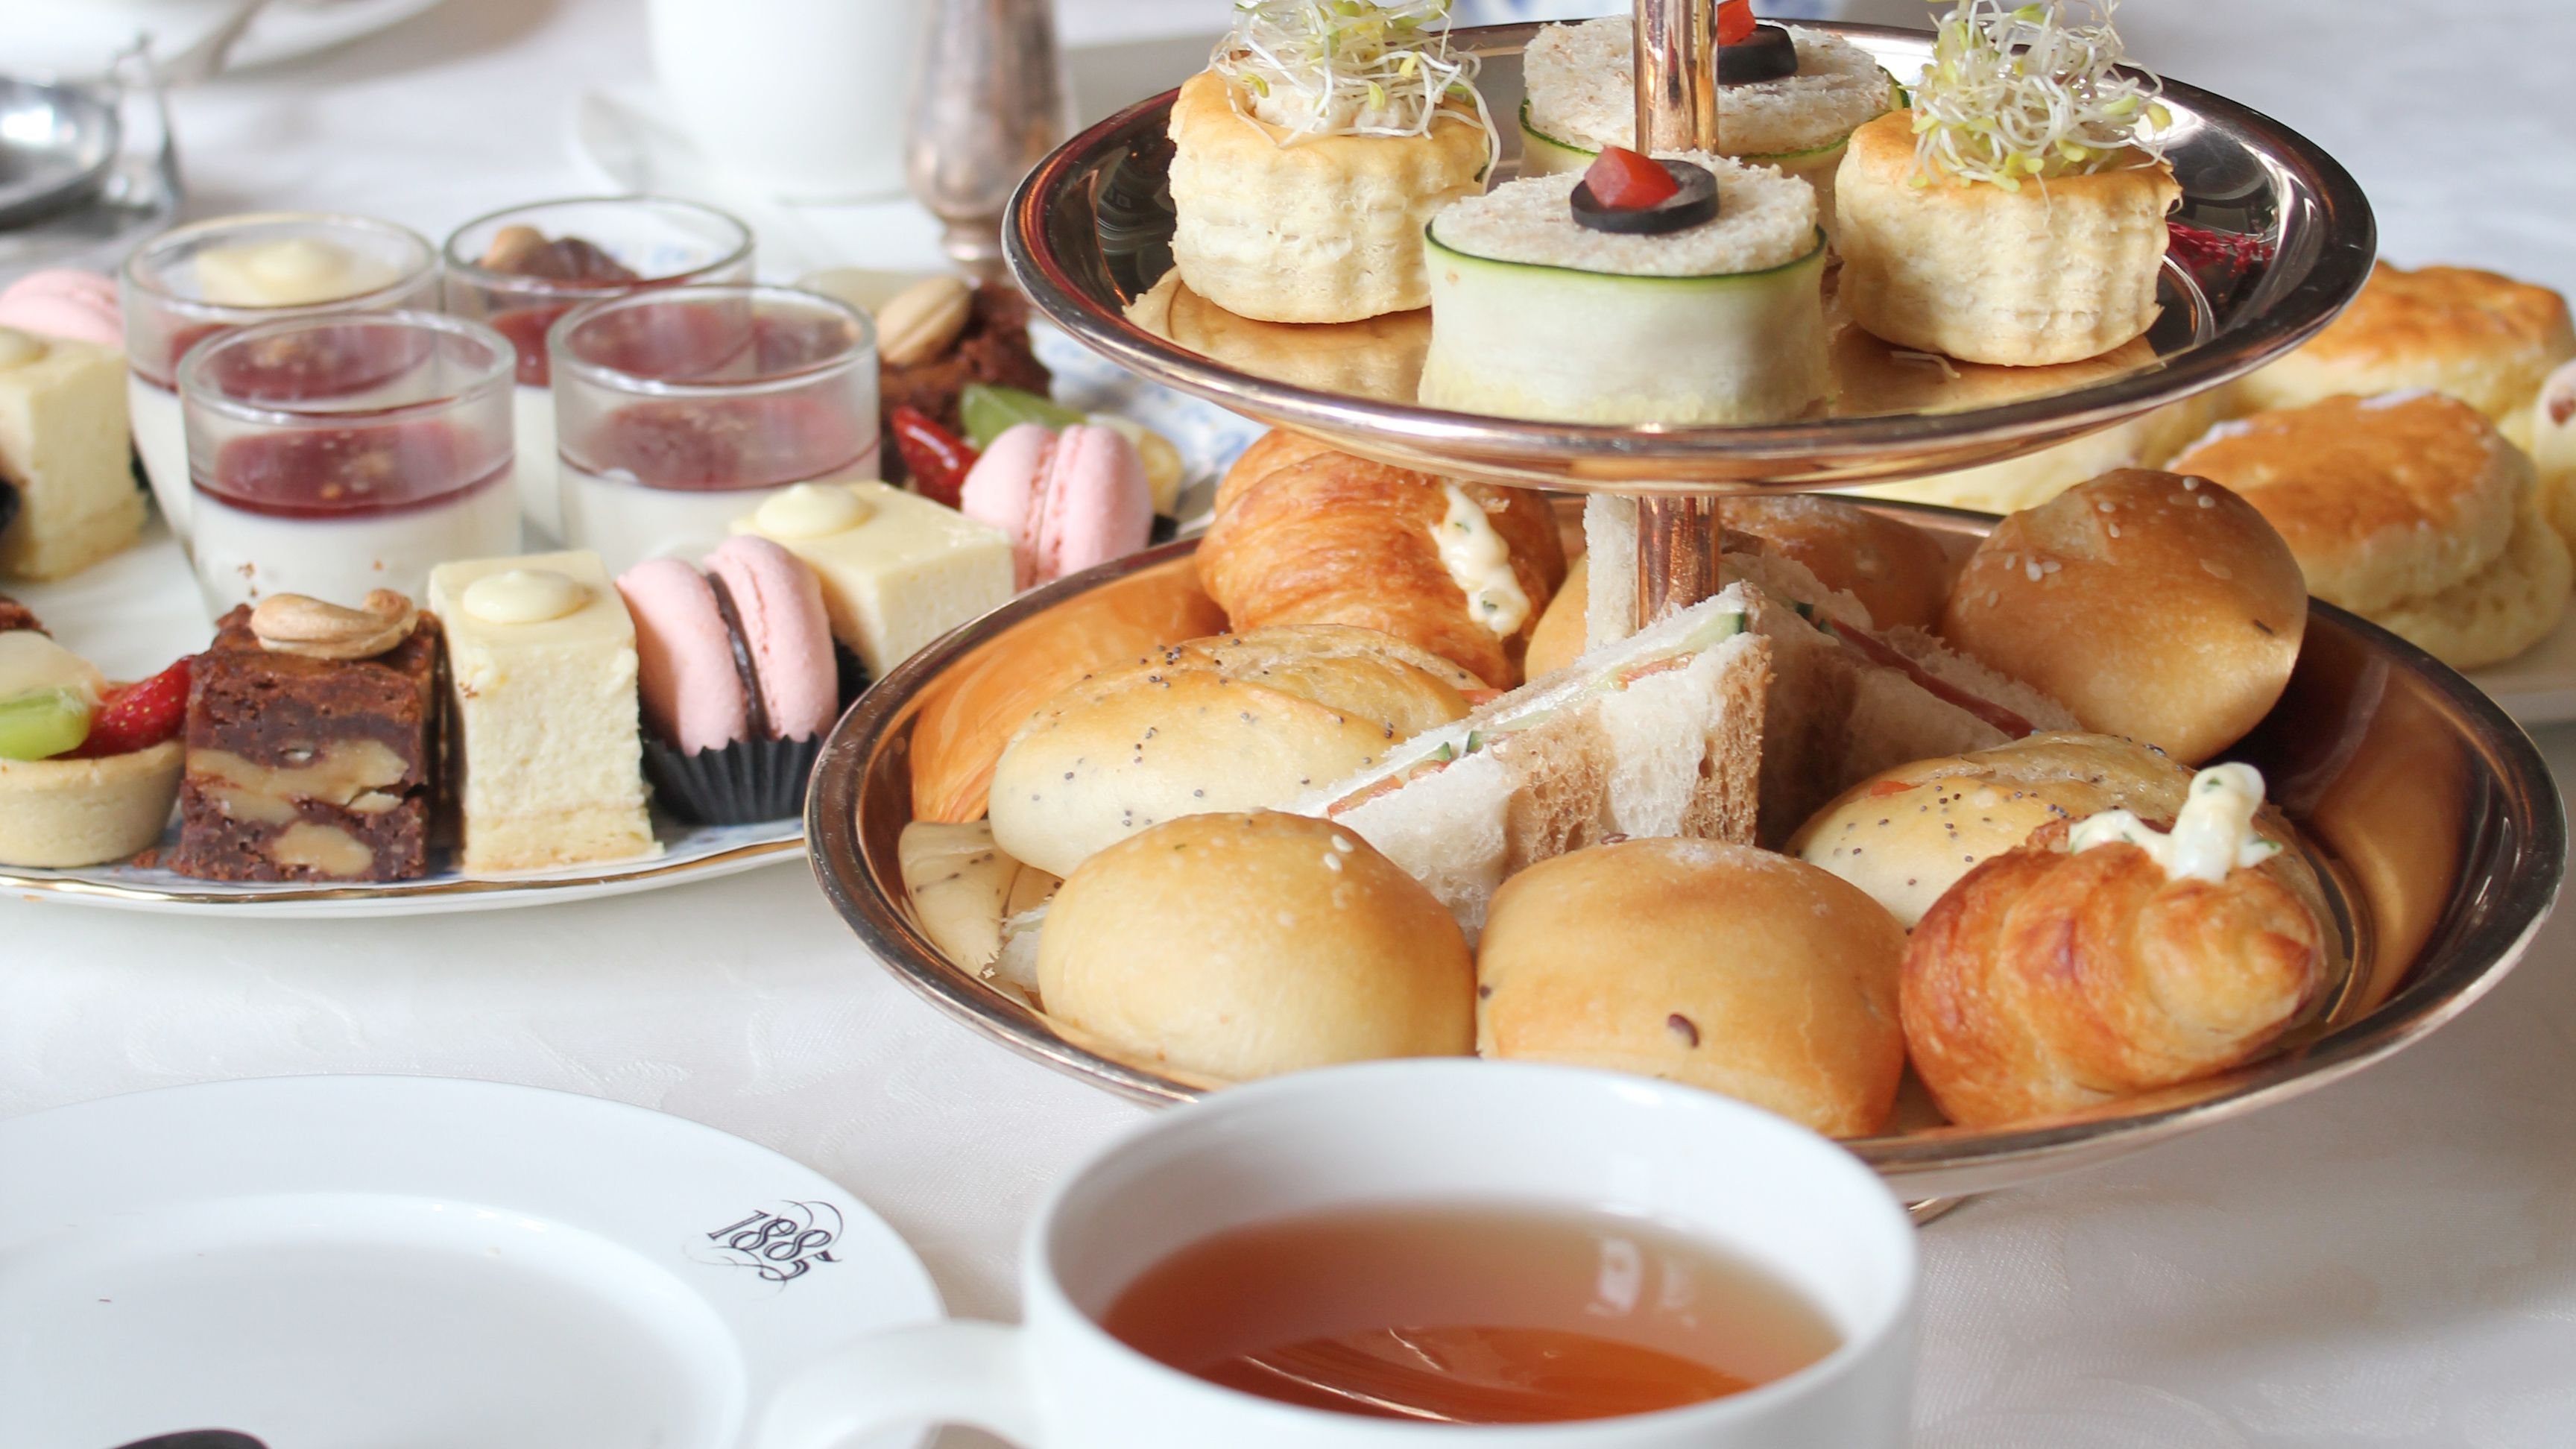 Teh Sore Tradisional Inggris di Eastern & Oriental Hotel